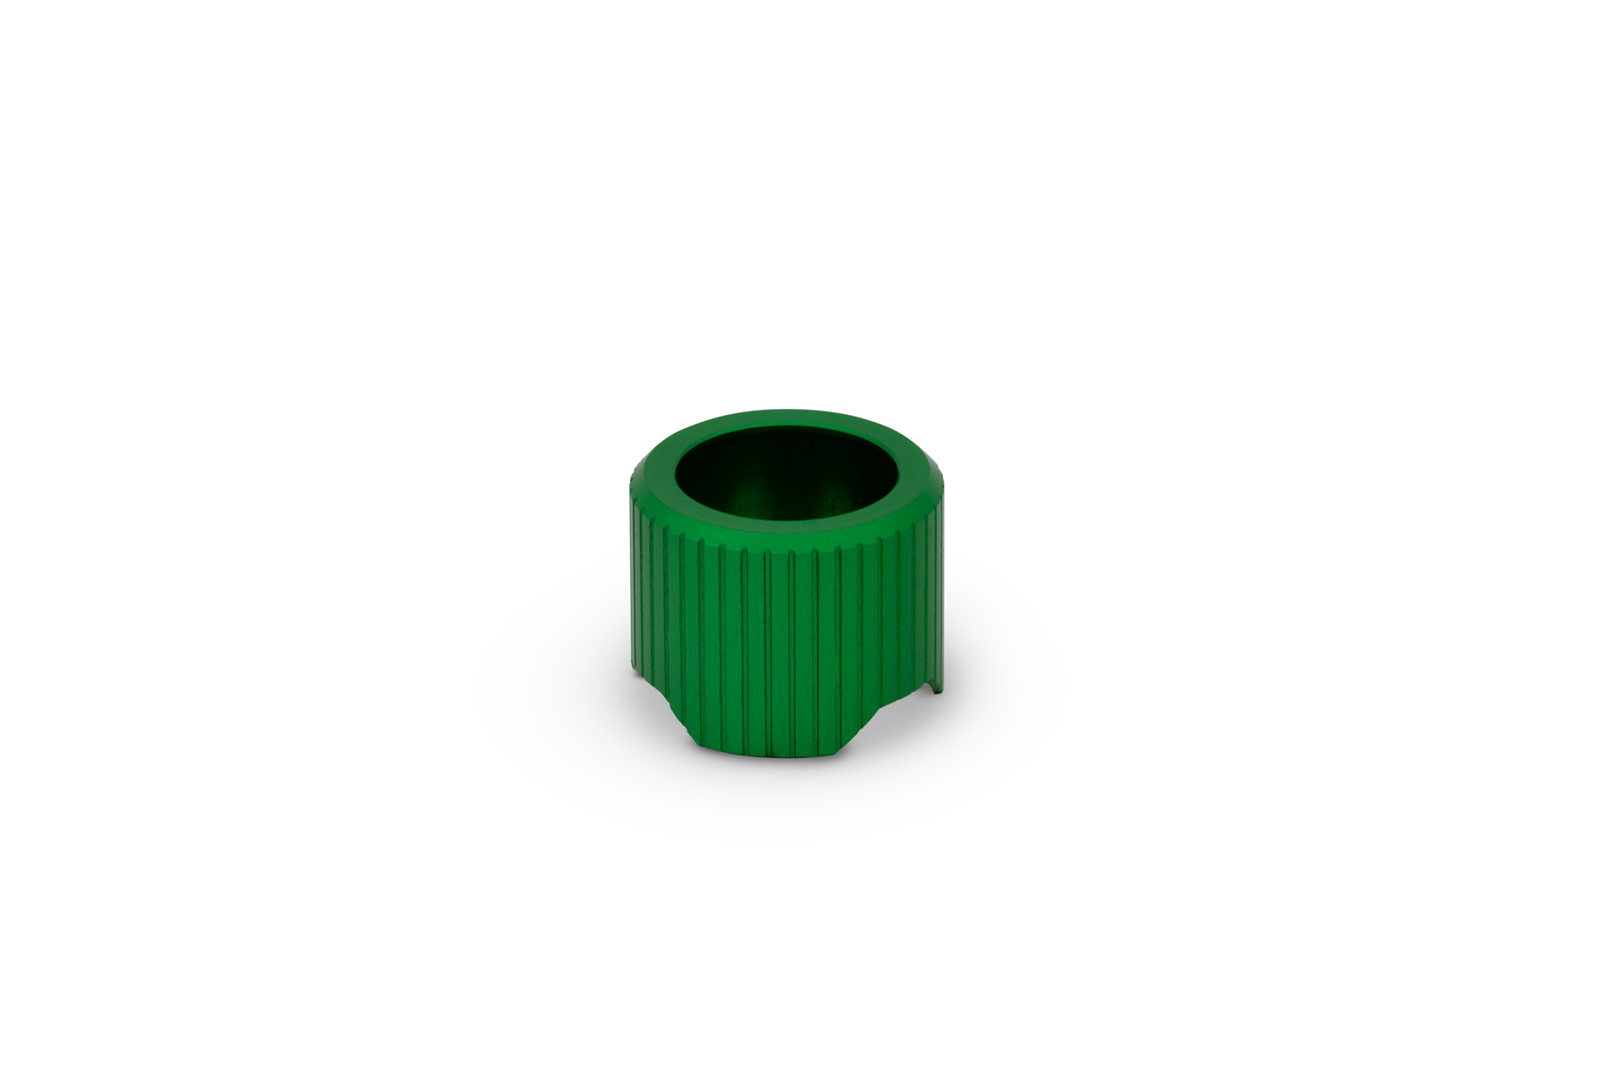 EK-Quantum_Torque_Compression_Ring_6-Pack_STC_13-Green_TOP